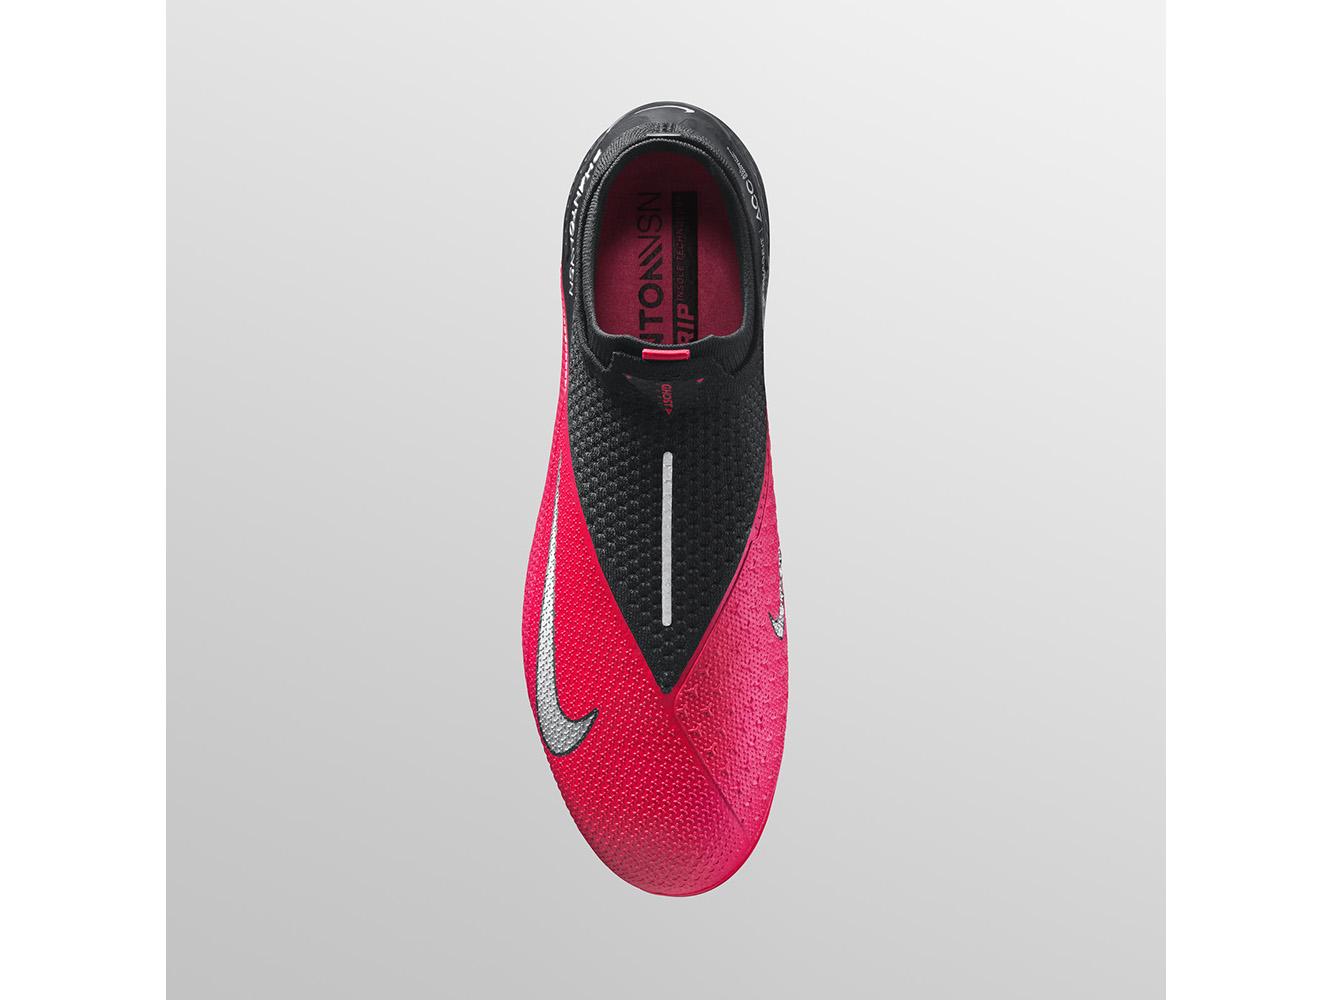 Nike_Football_PhantomVSN2_EliteFG_93356